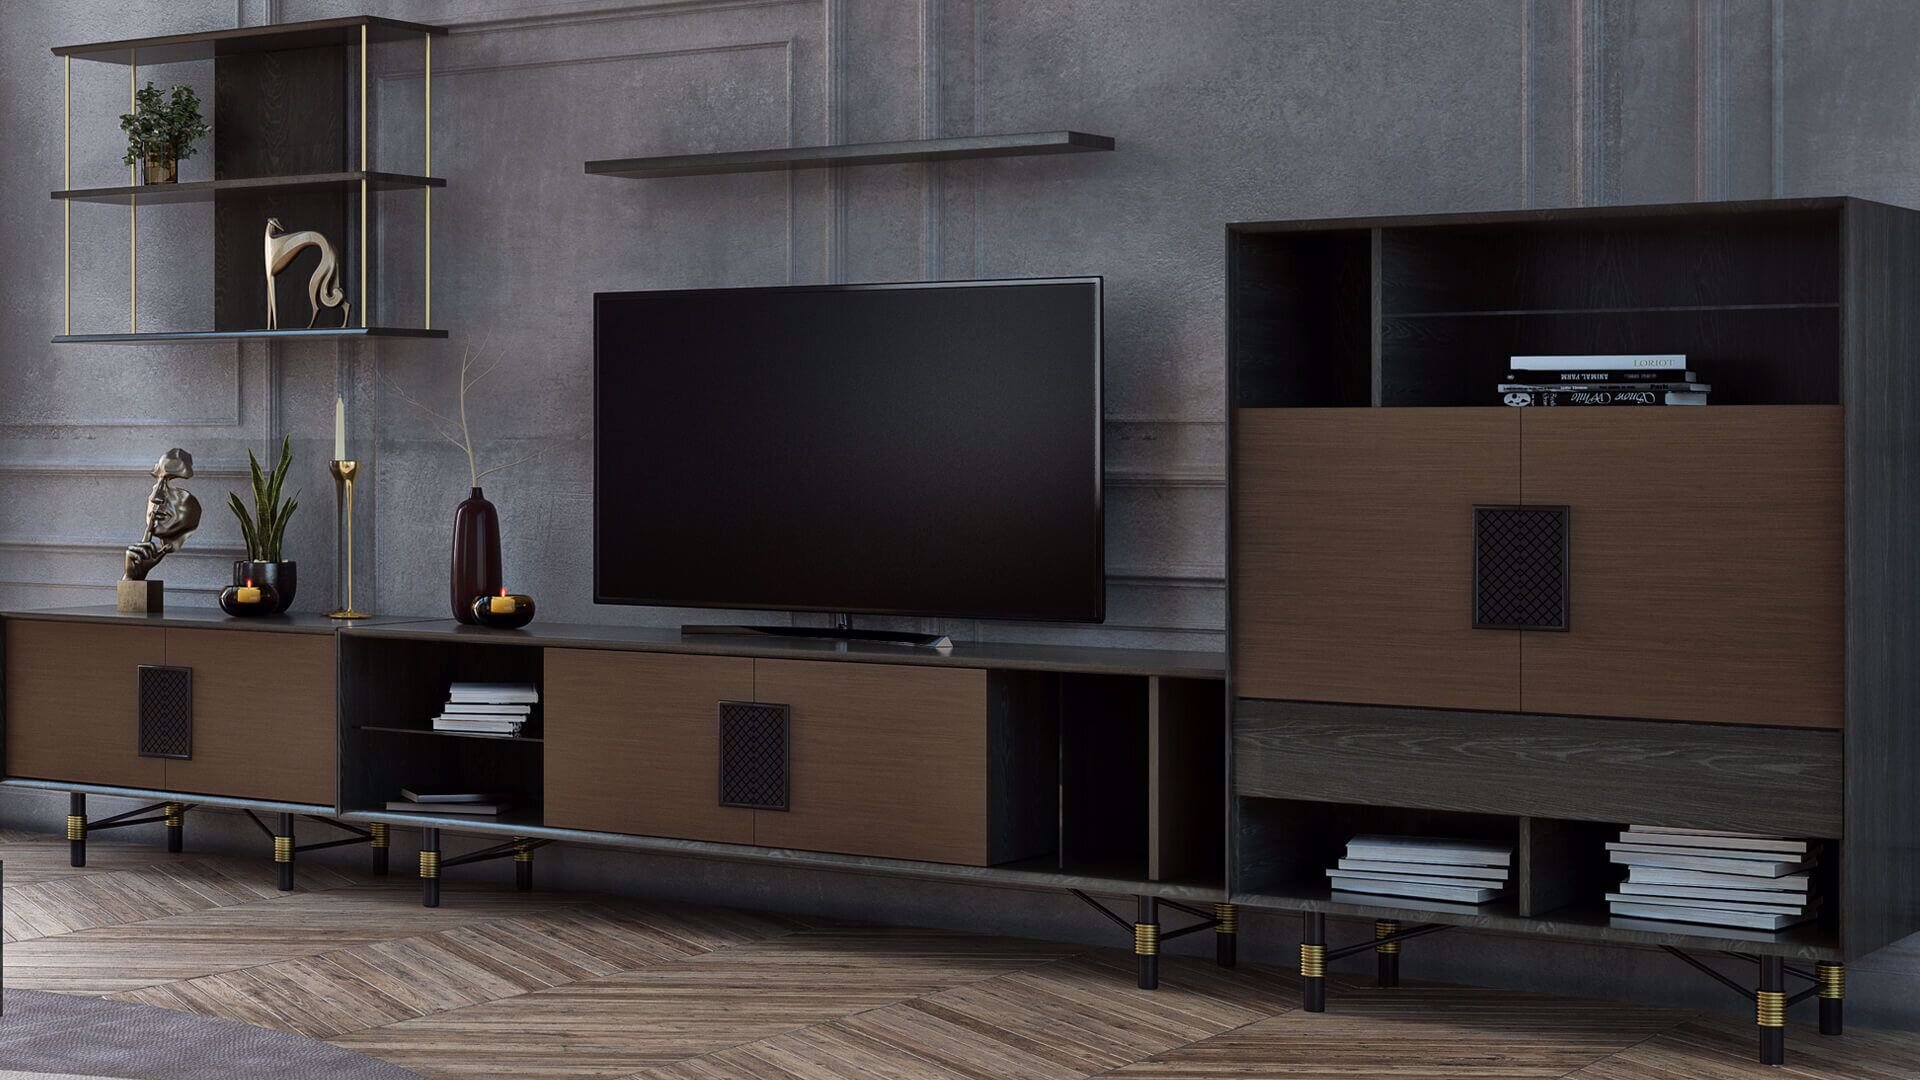 Milagro Tv Sehpası (160 Cm)